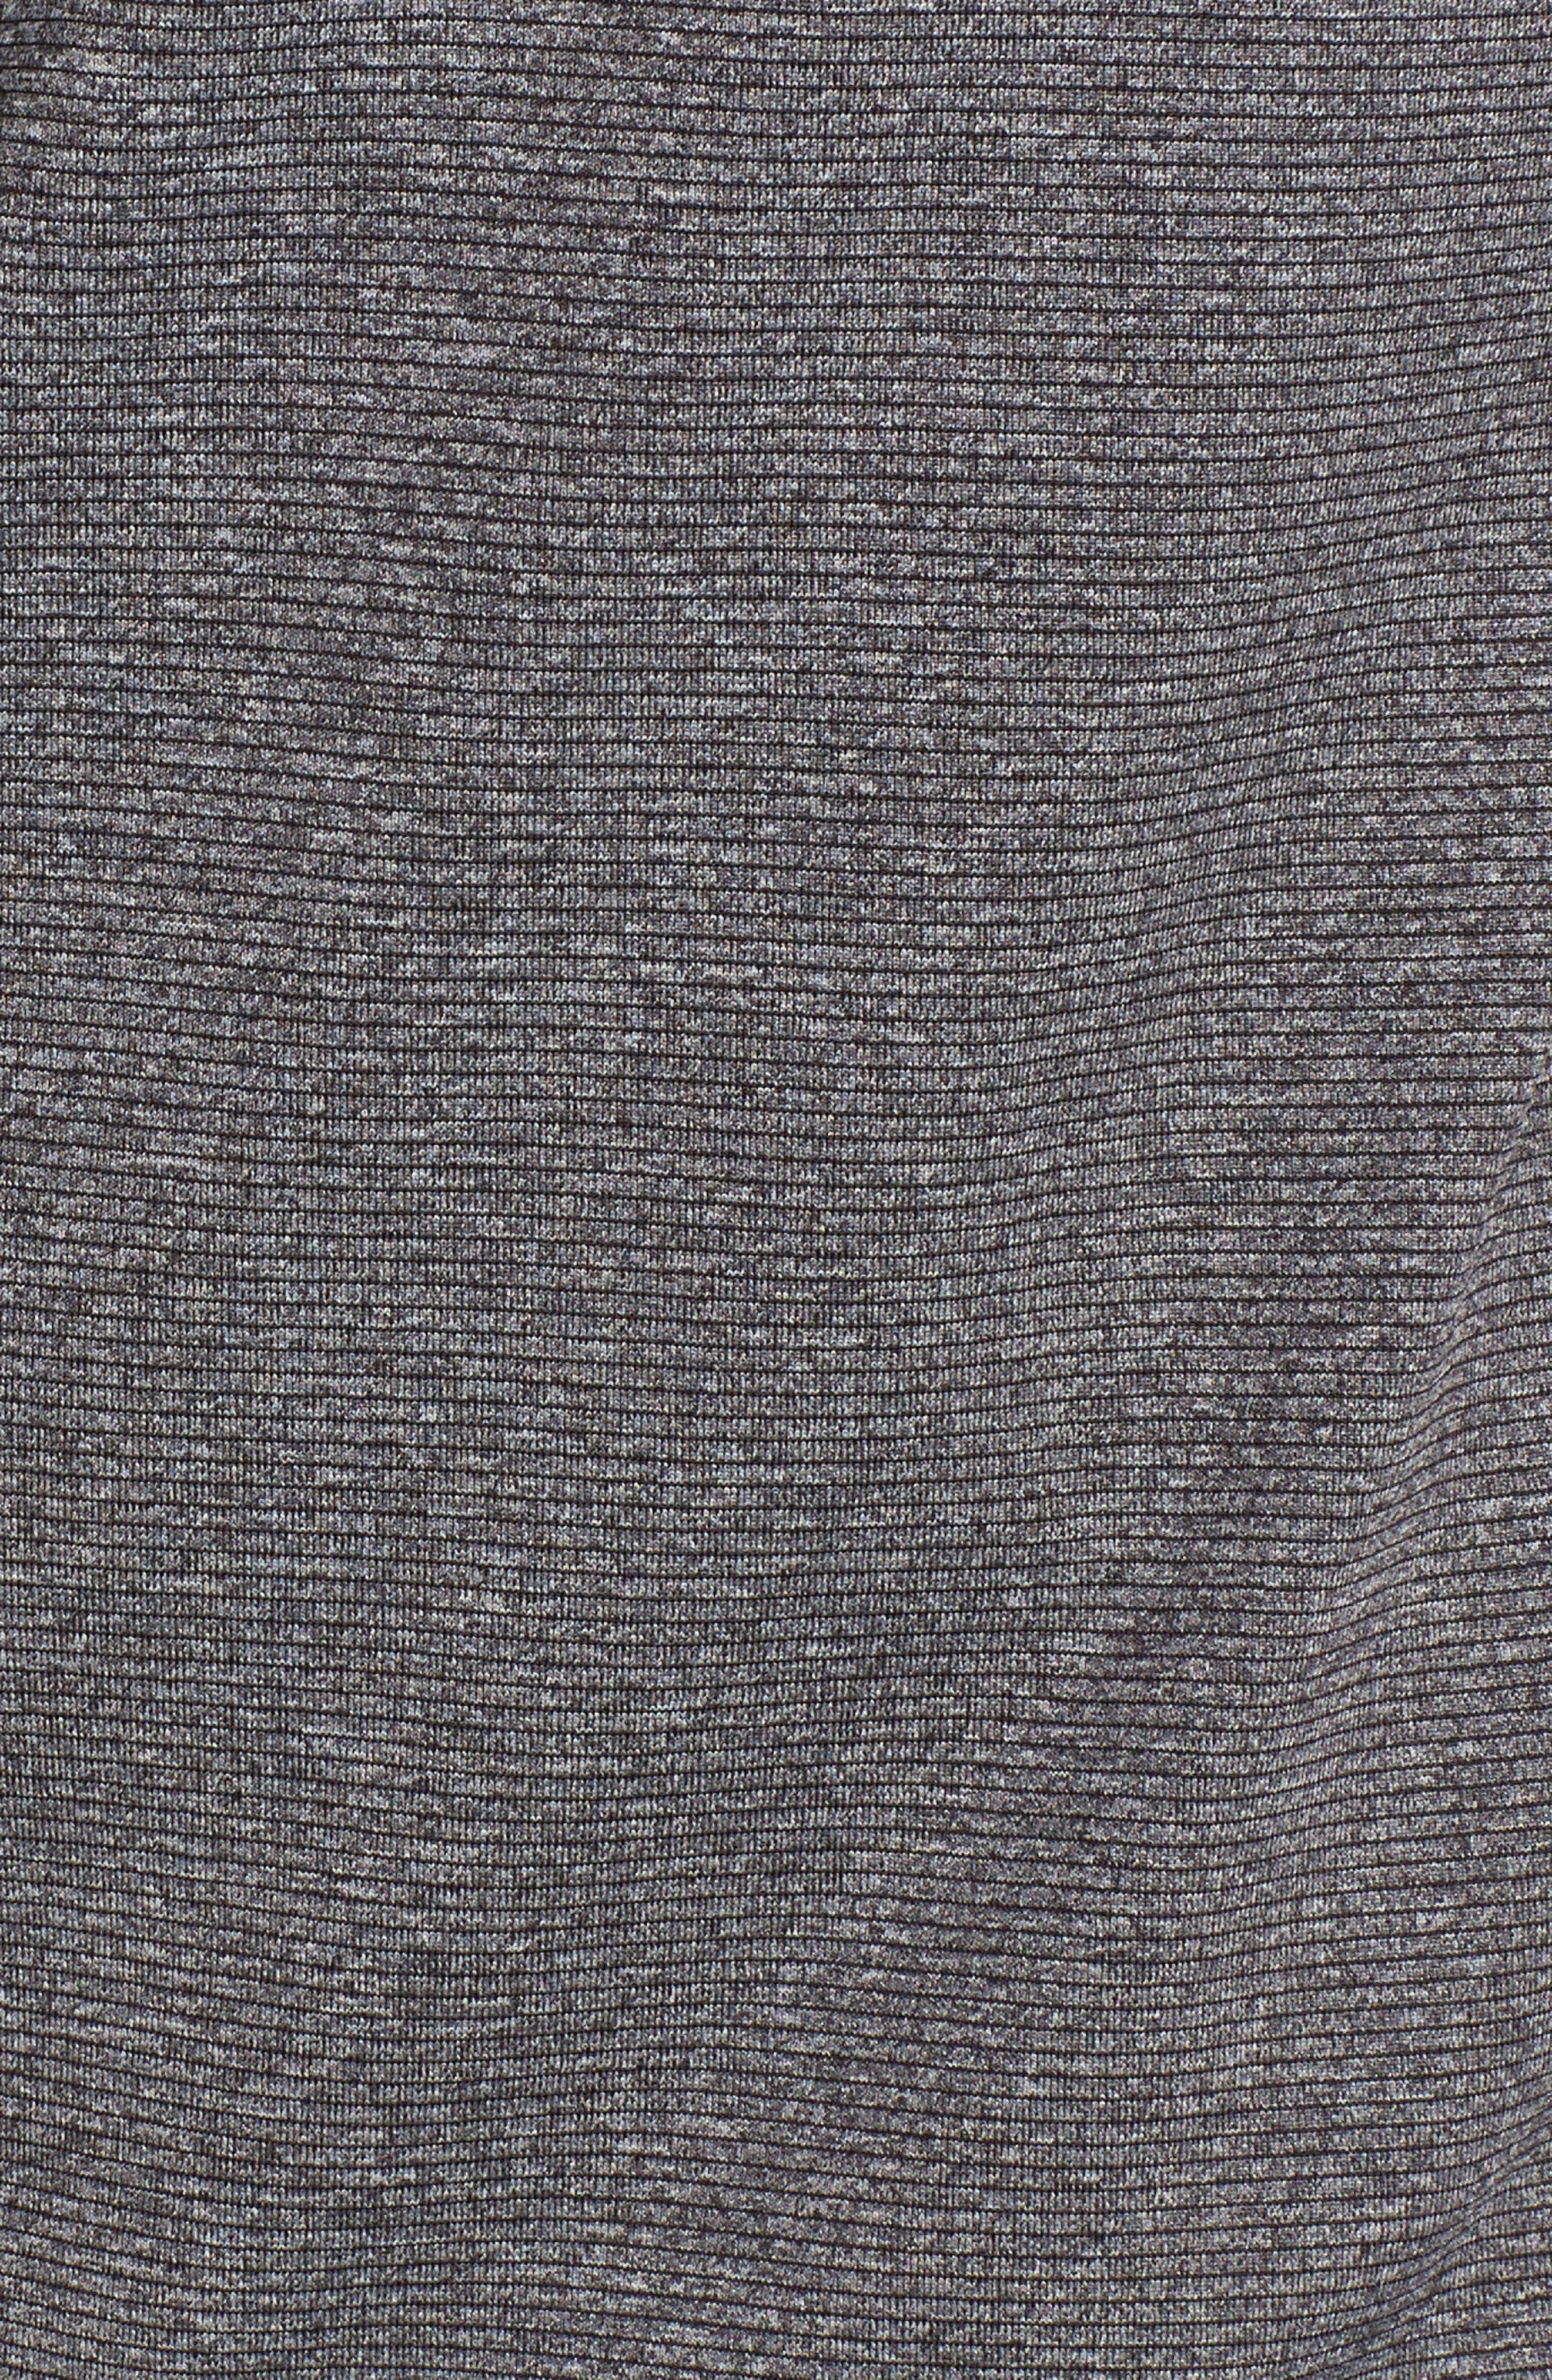 Shoreline - Carolina Panthers Half Zip Pullover,                             Alternate thumbnail 5, color,                             Charcoal Heather